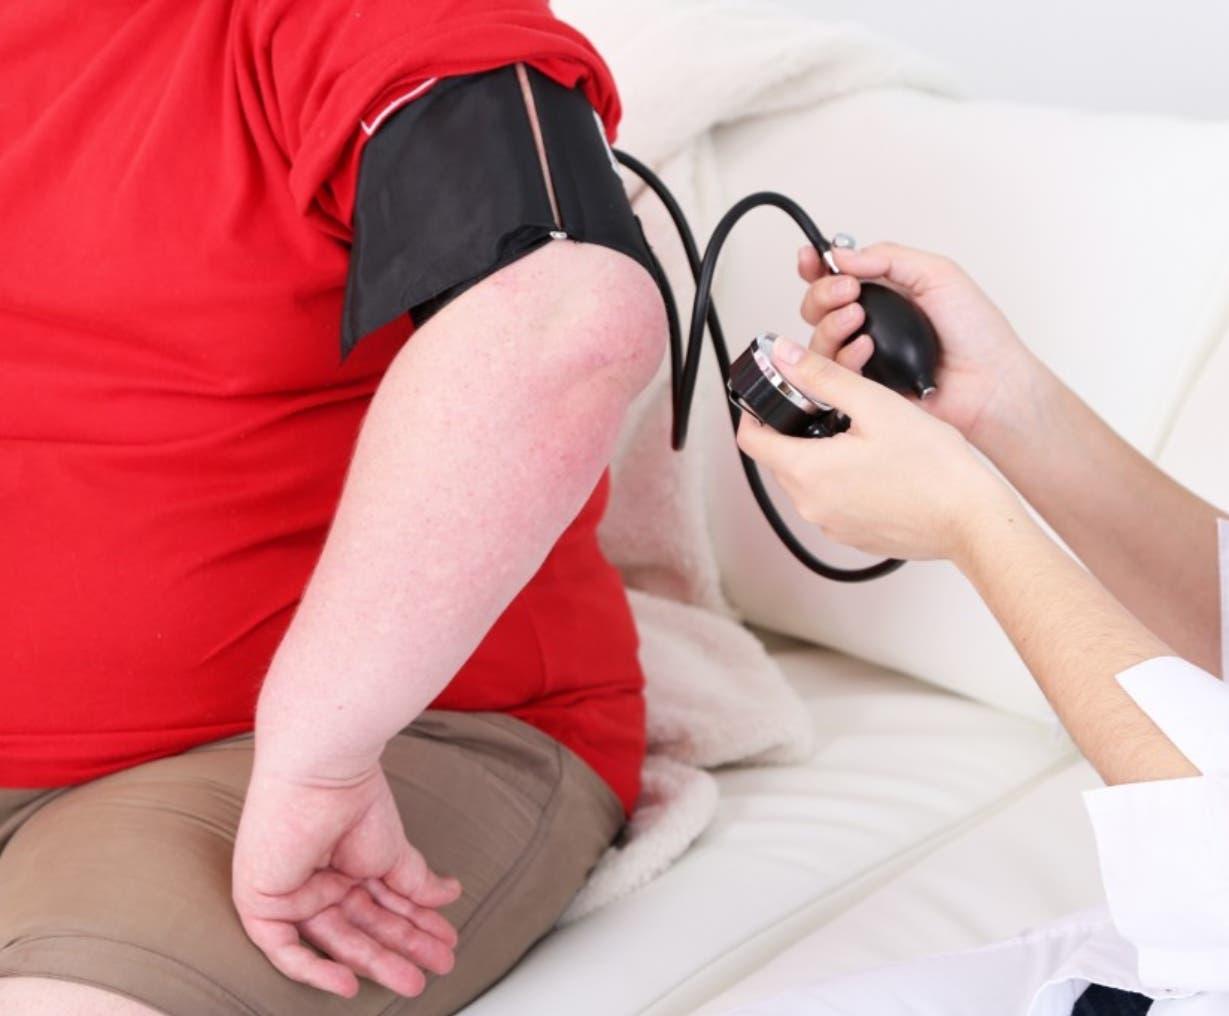 Males cardiovasculares,  considerados principal causa de muerte